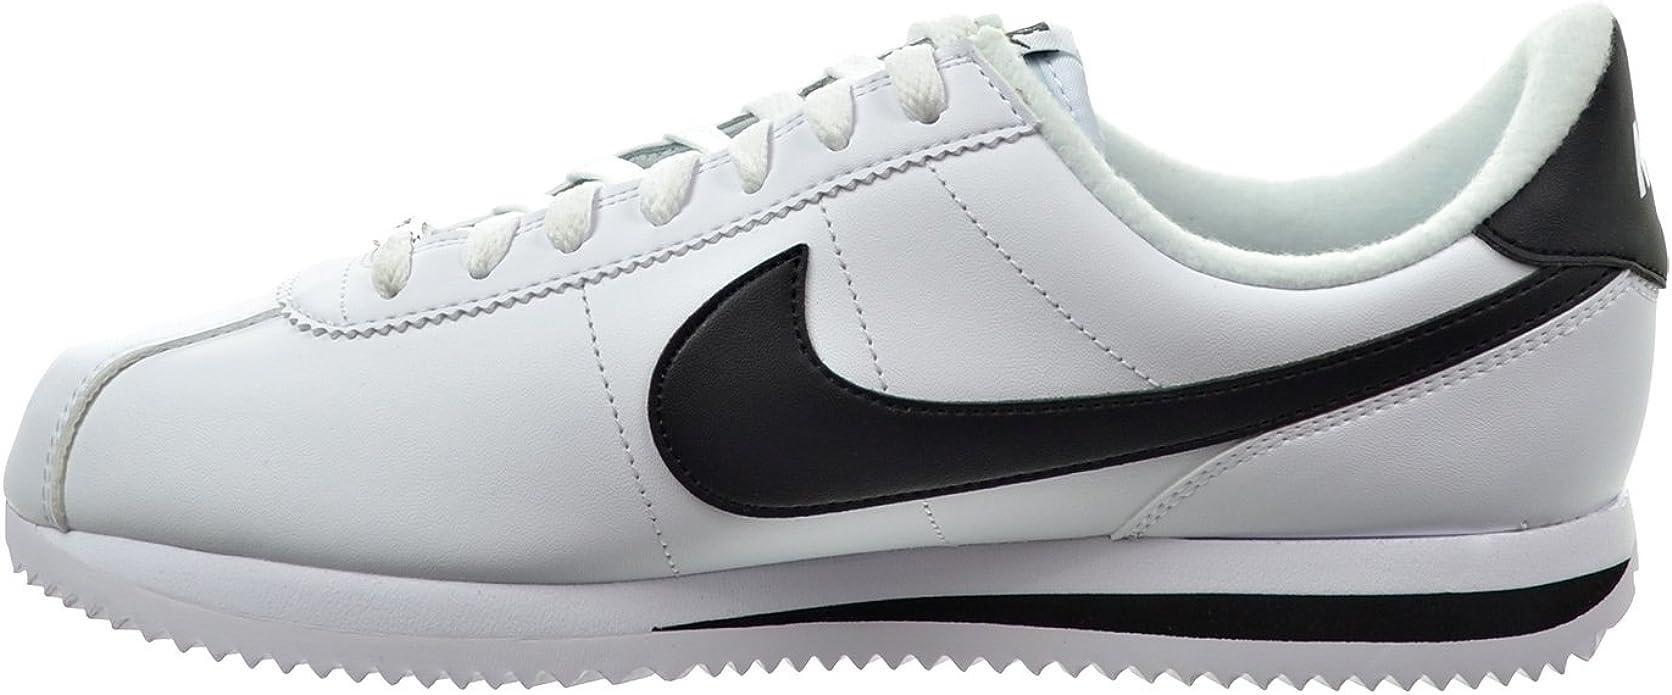 nike cortez leather bianco